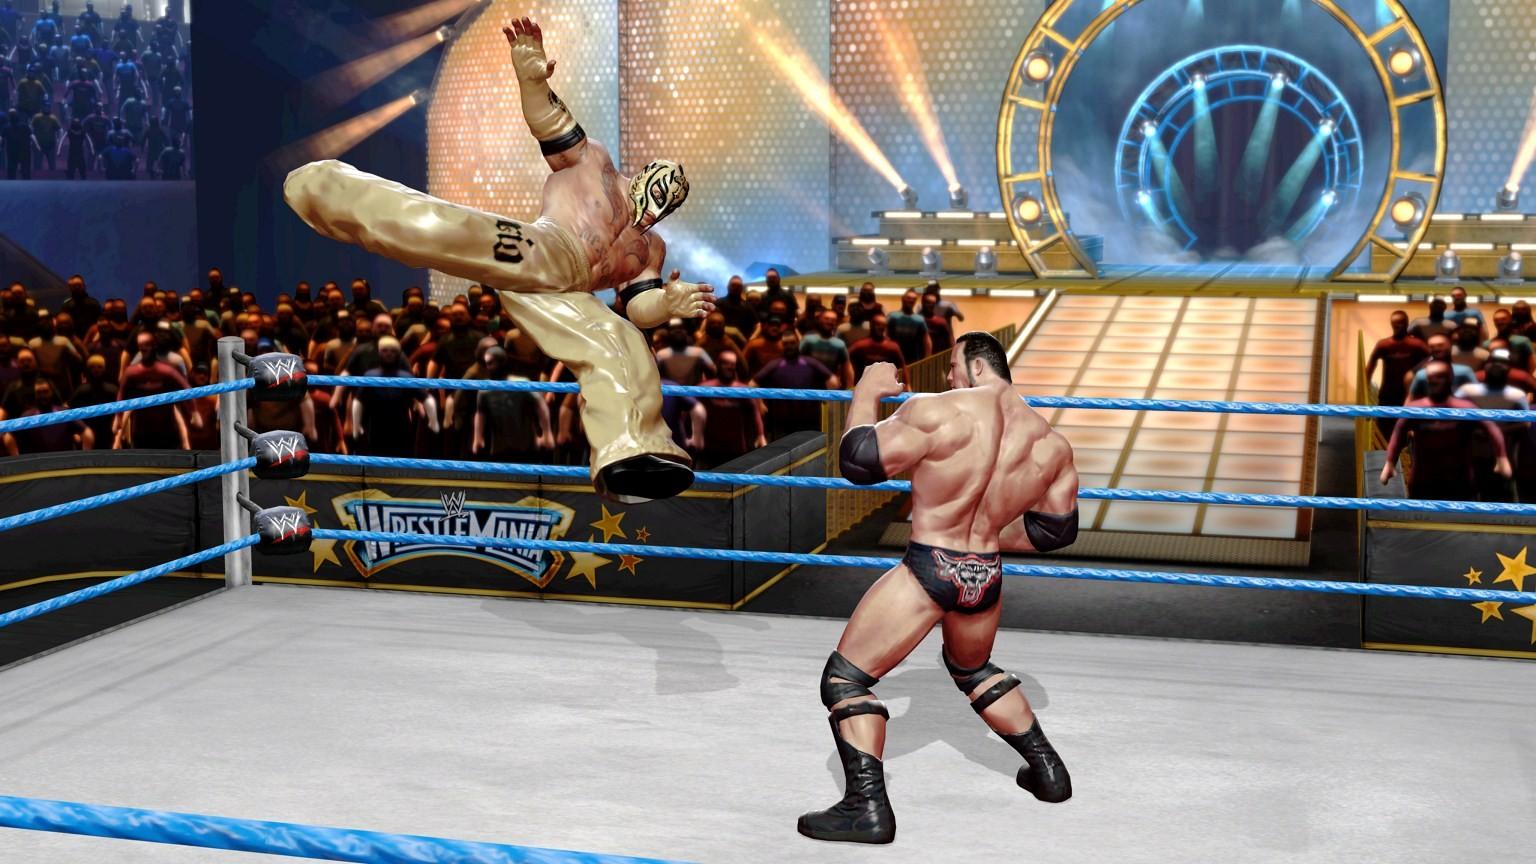 WWE All Stars - Wrestling